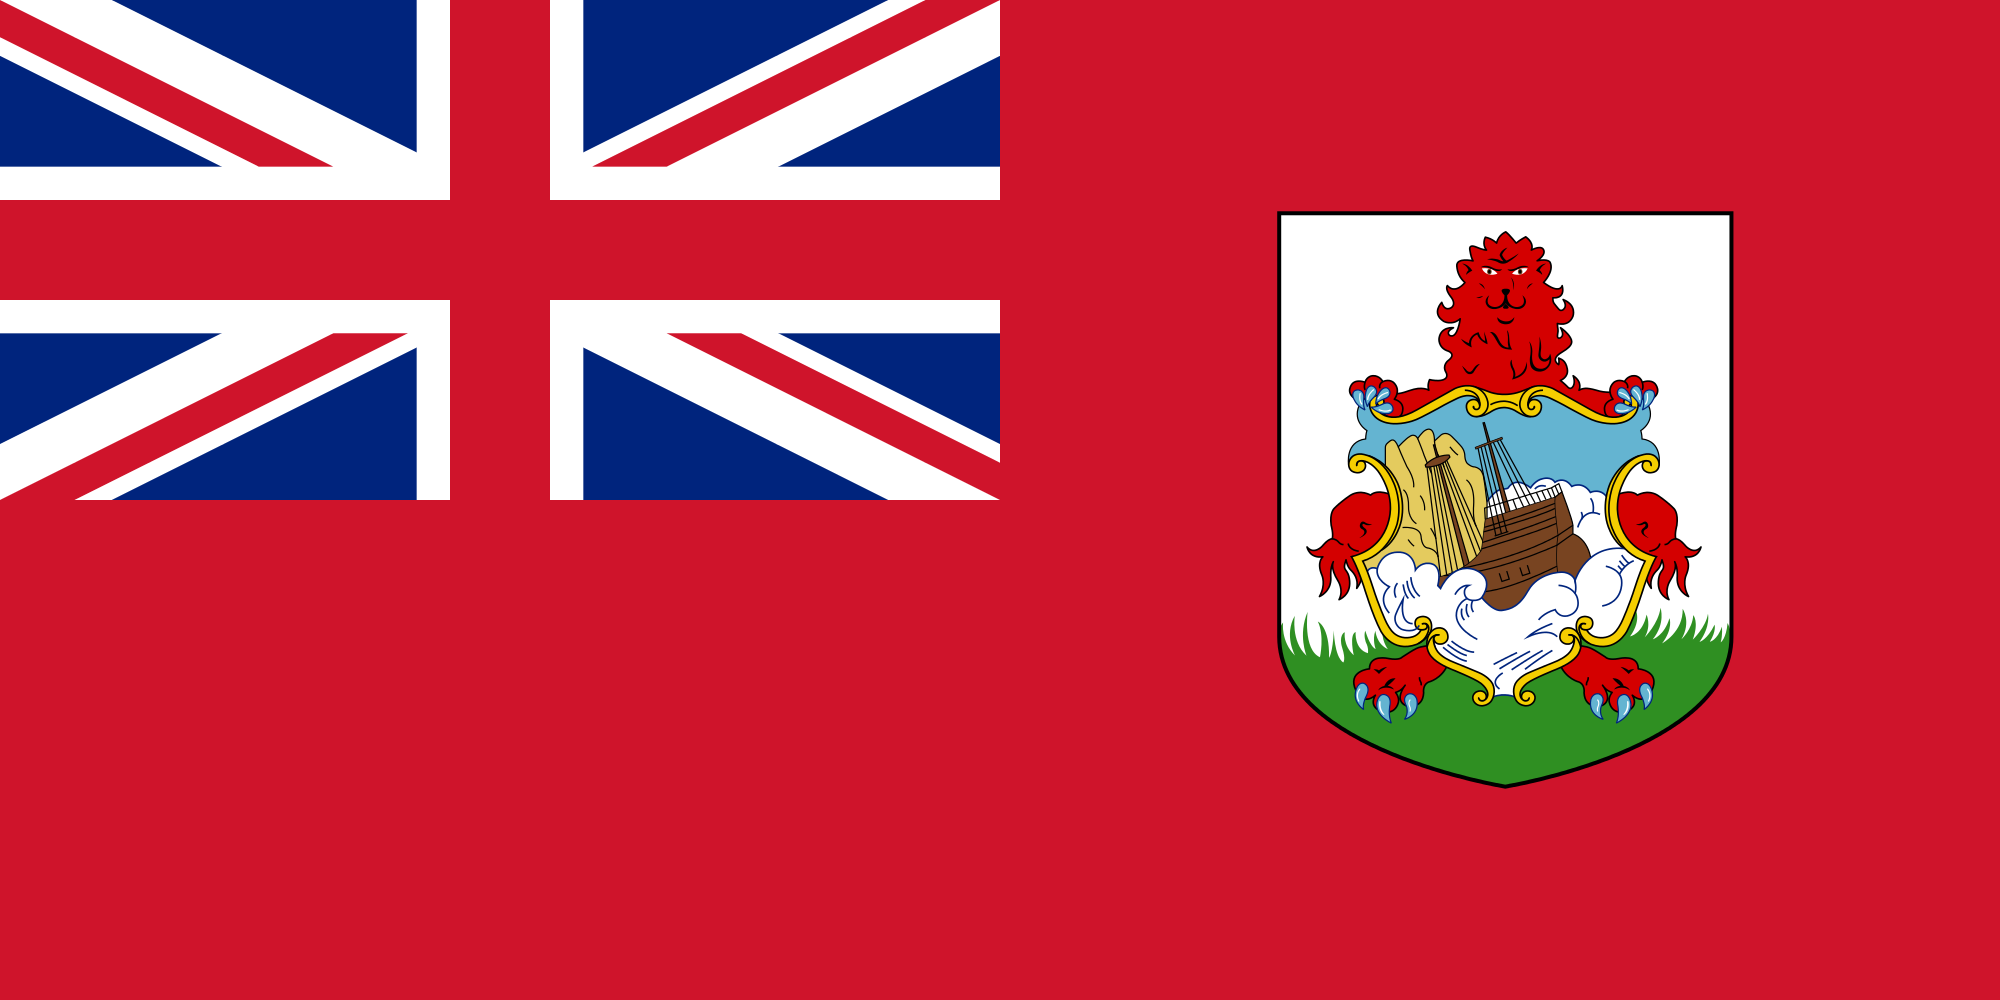 Bermudes, pays, emblème, logo, symbole - Fonds d'écran HD - Professor-falken.com